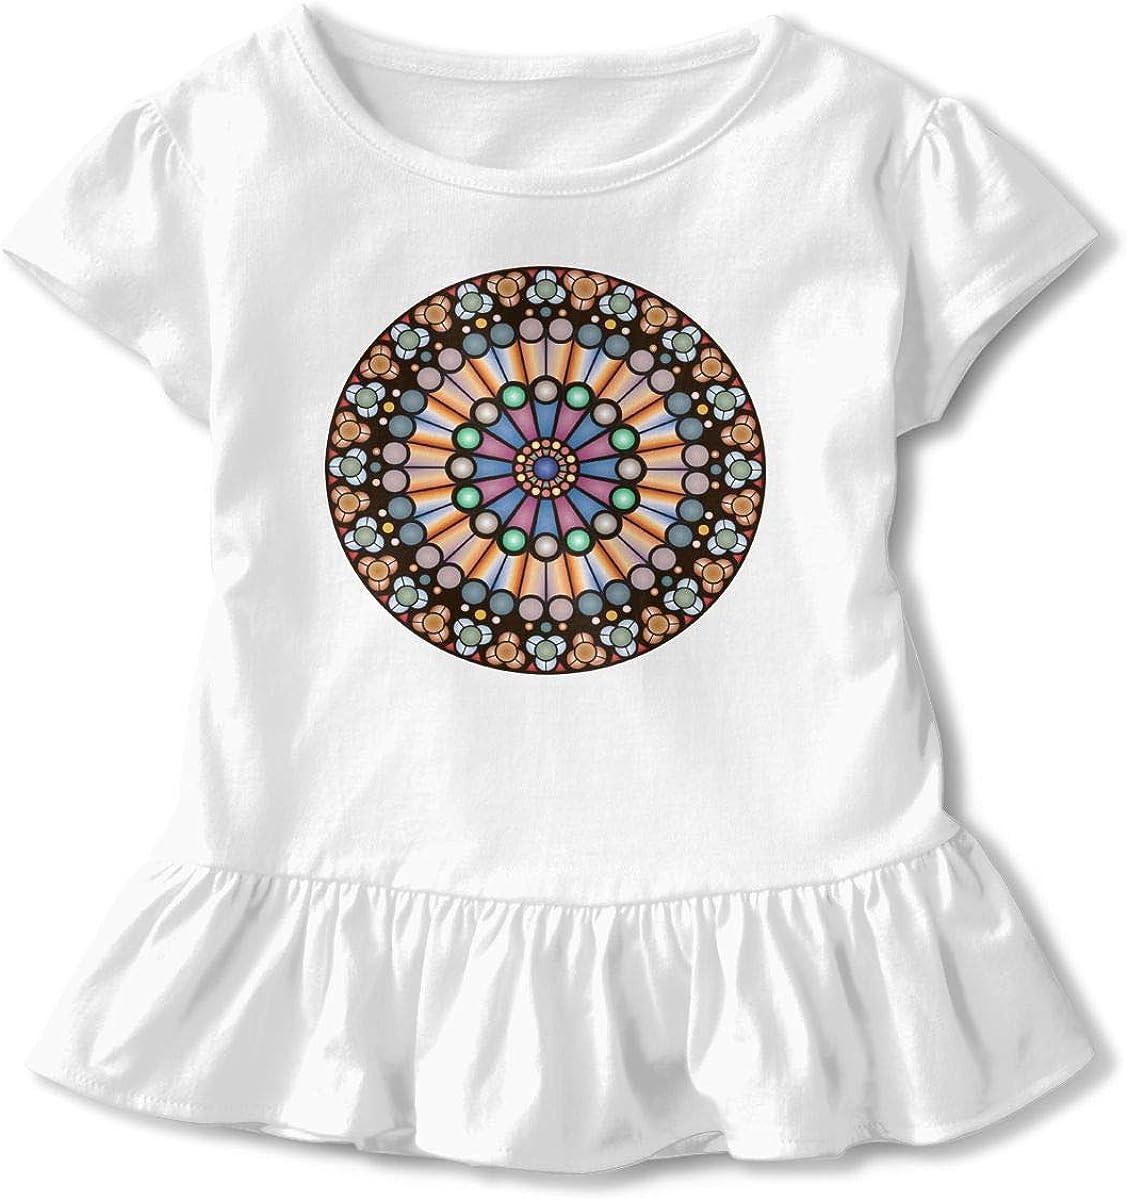 Rose Window Notre Dame De Paris Toddler Baby Girl Short Sleeve Cotton Shirts